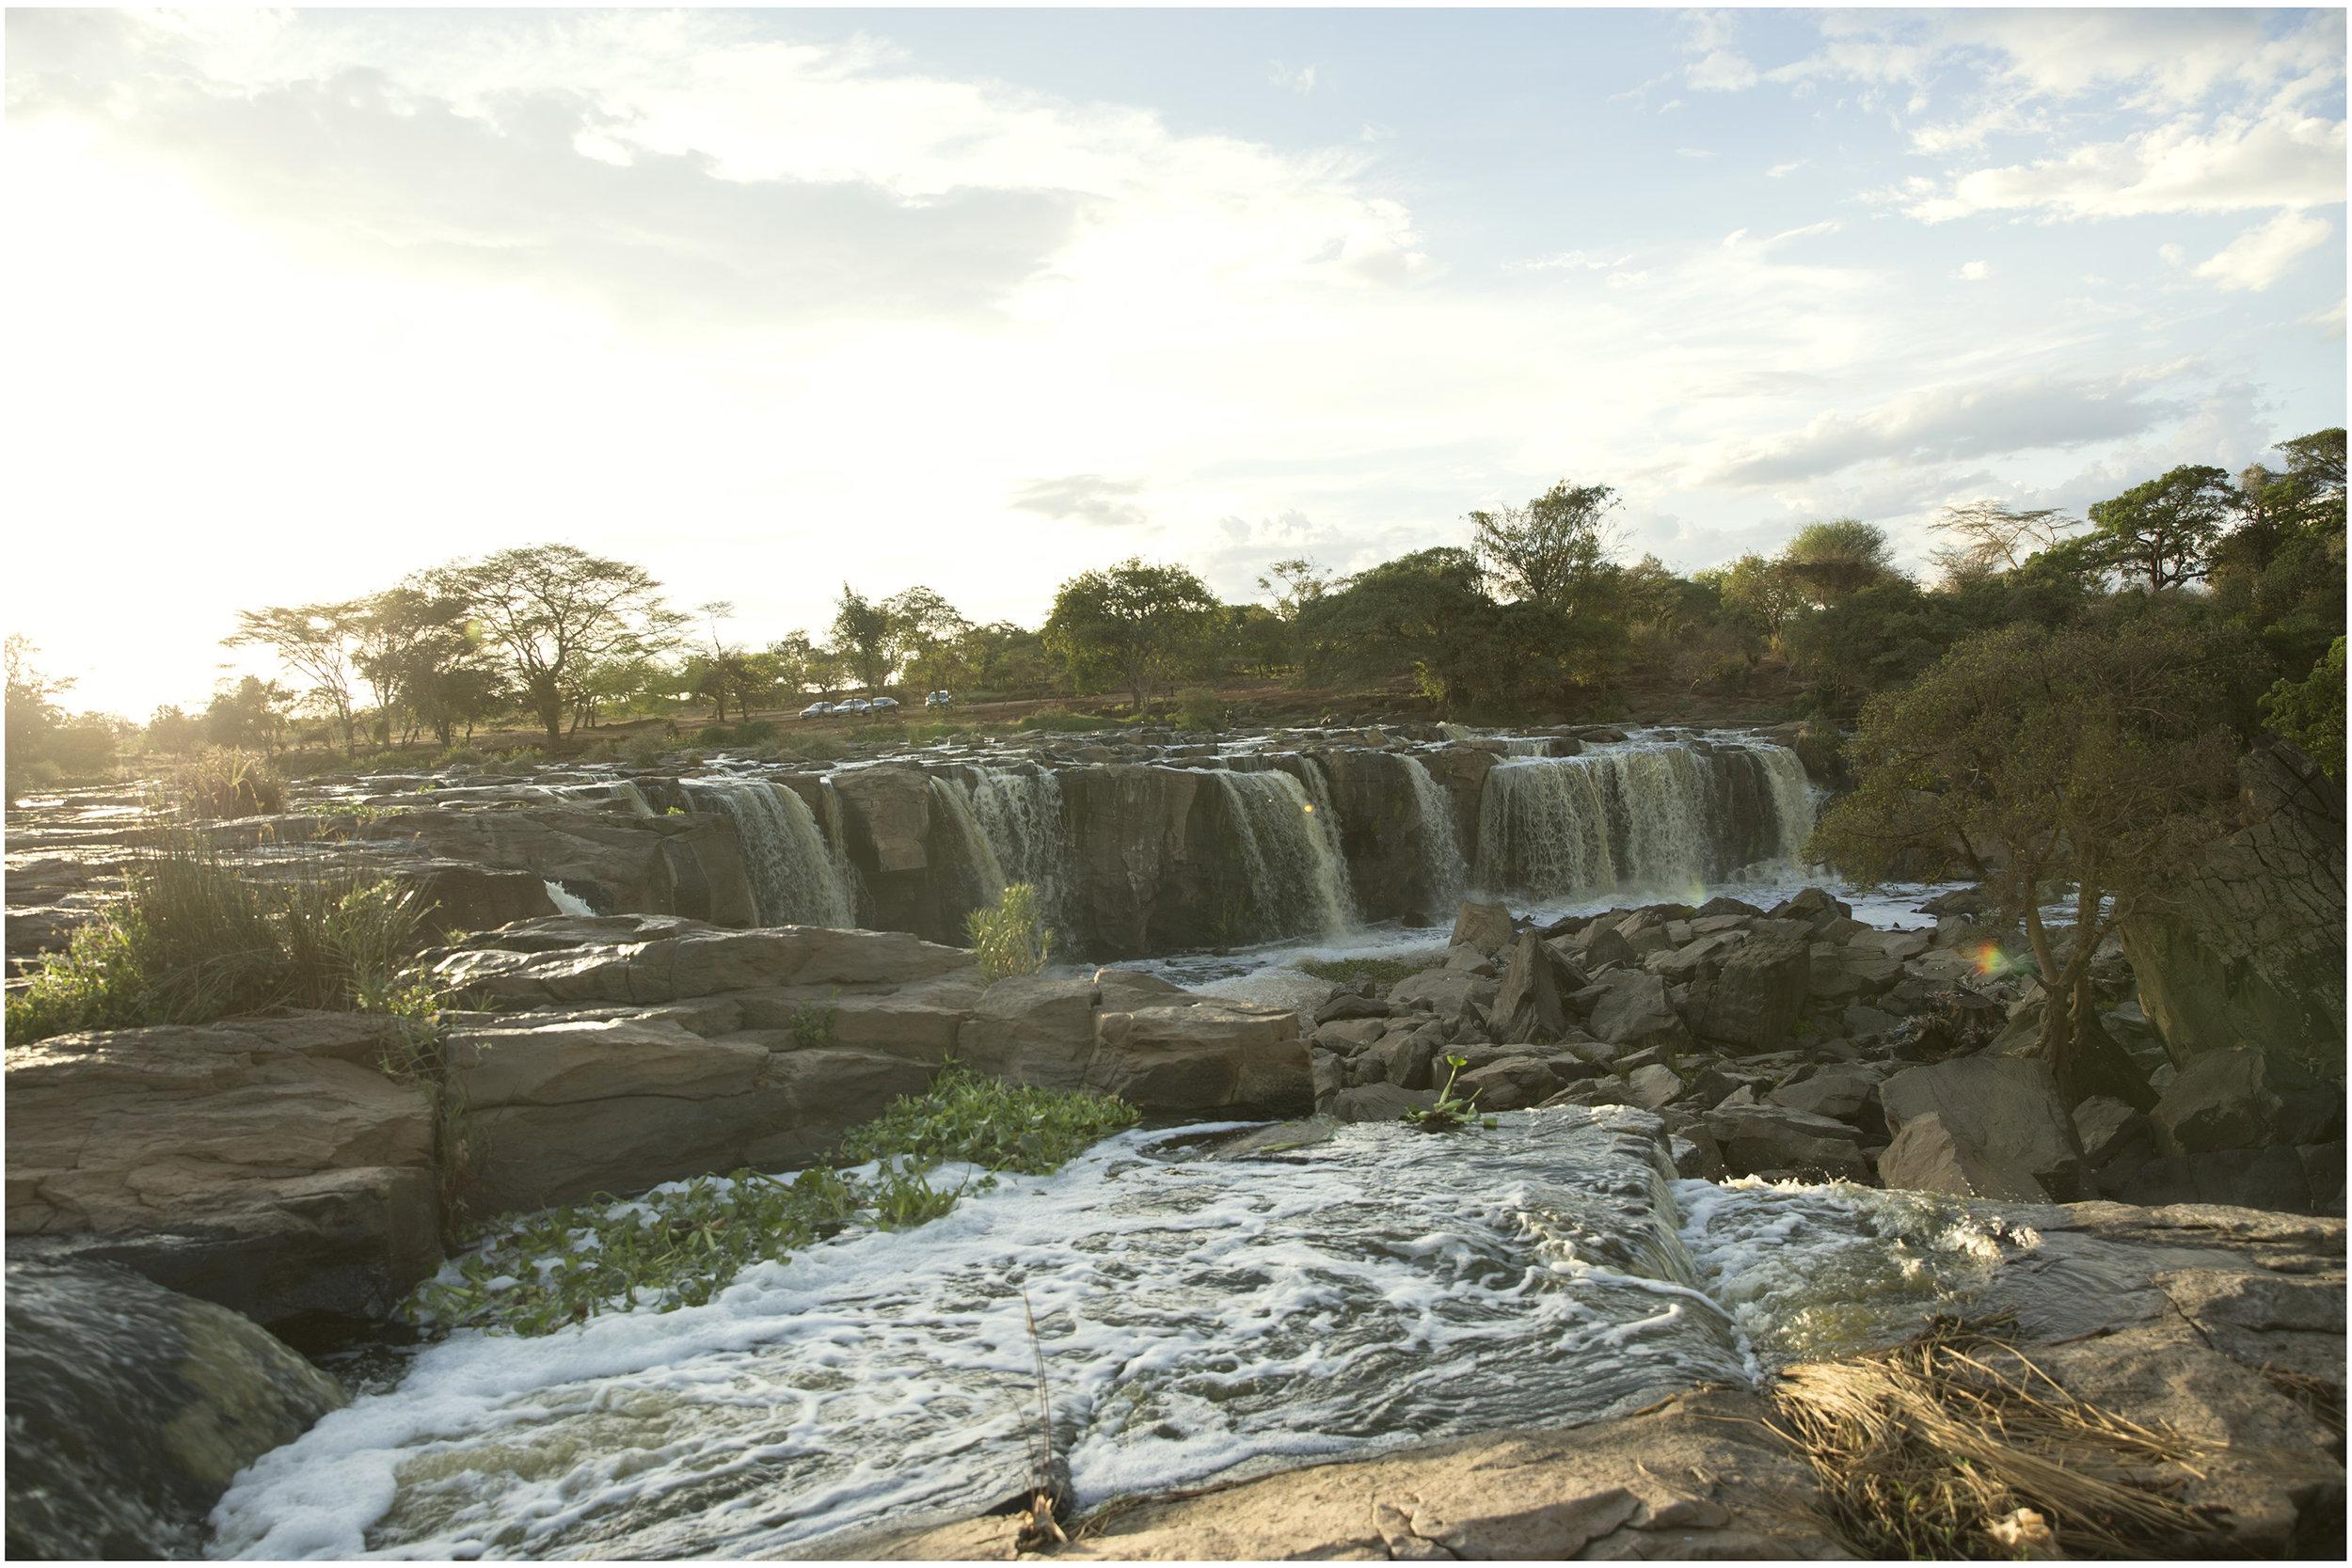 Fourteen Falls, Thika, Kenya. (View from Machakos County)